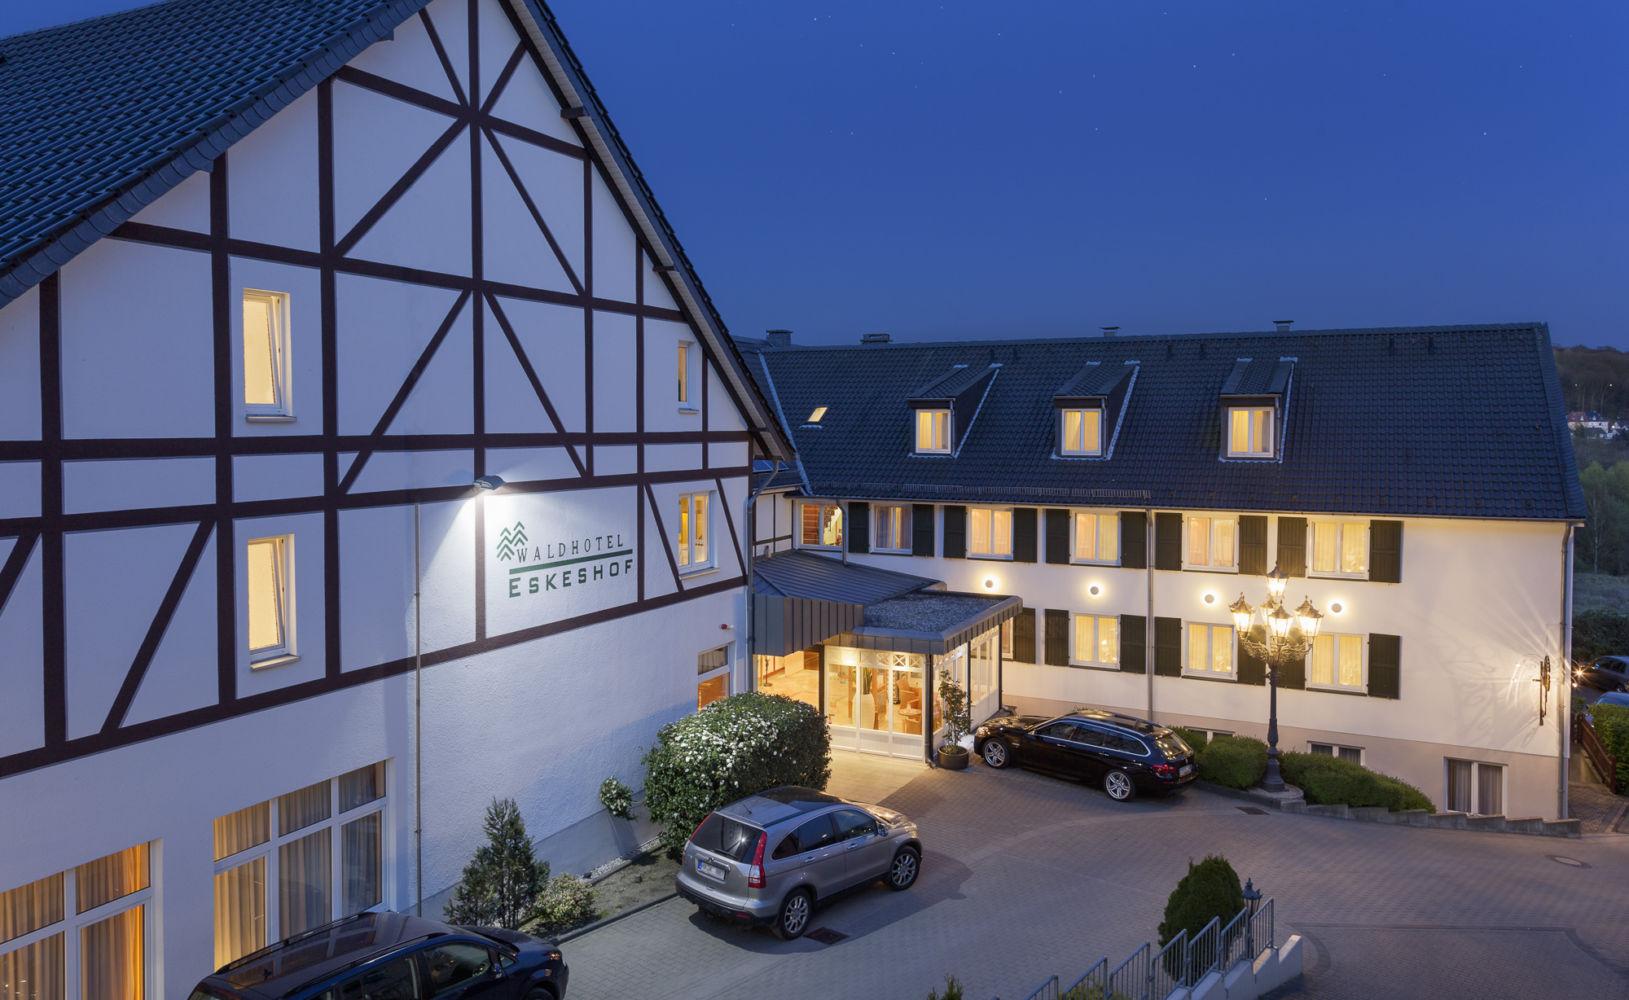 fotograf-monheim-hotelfotograf